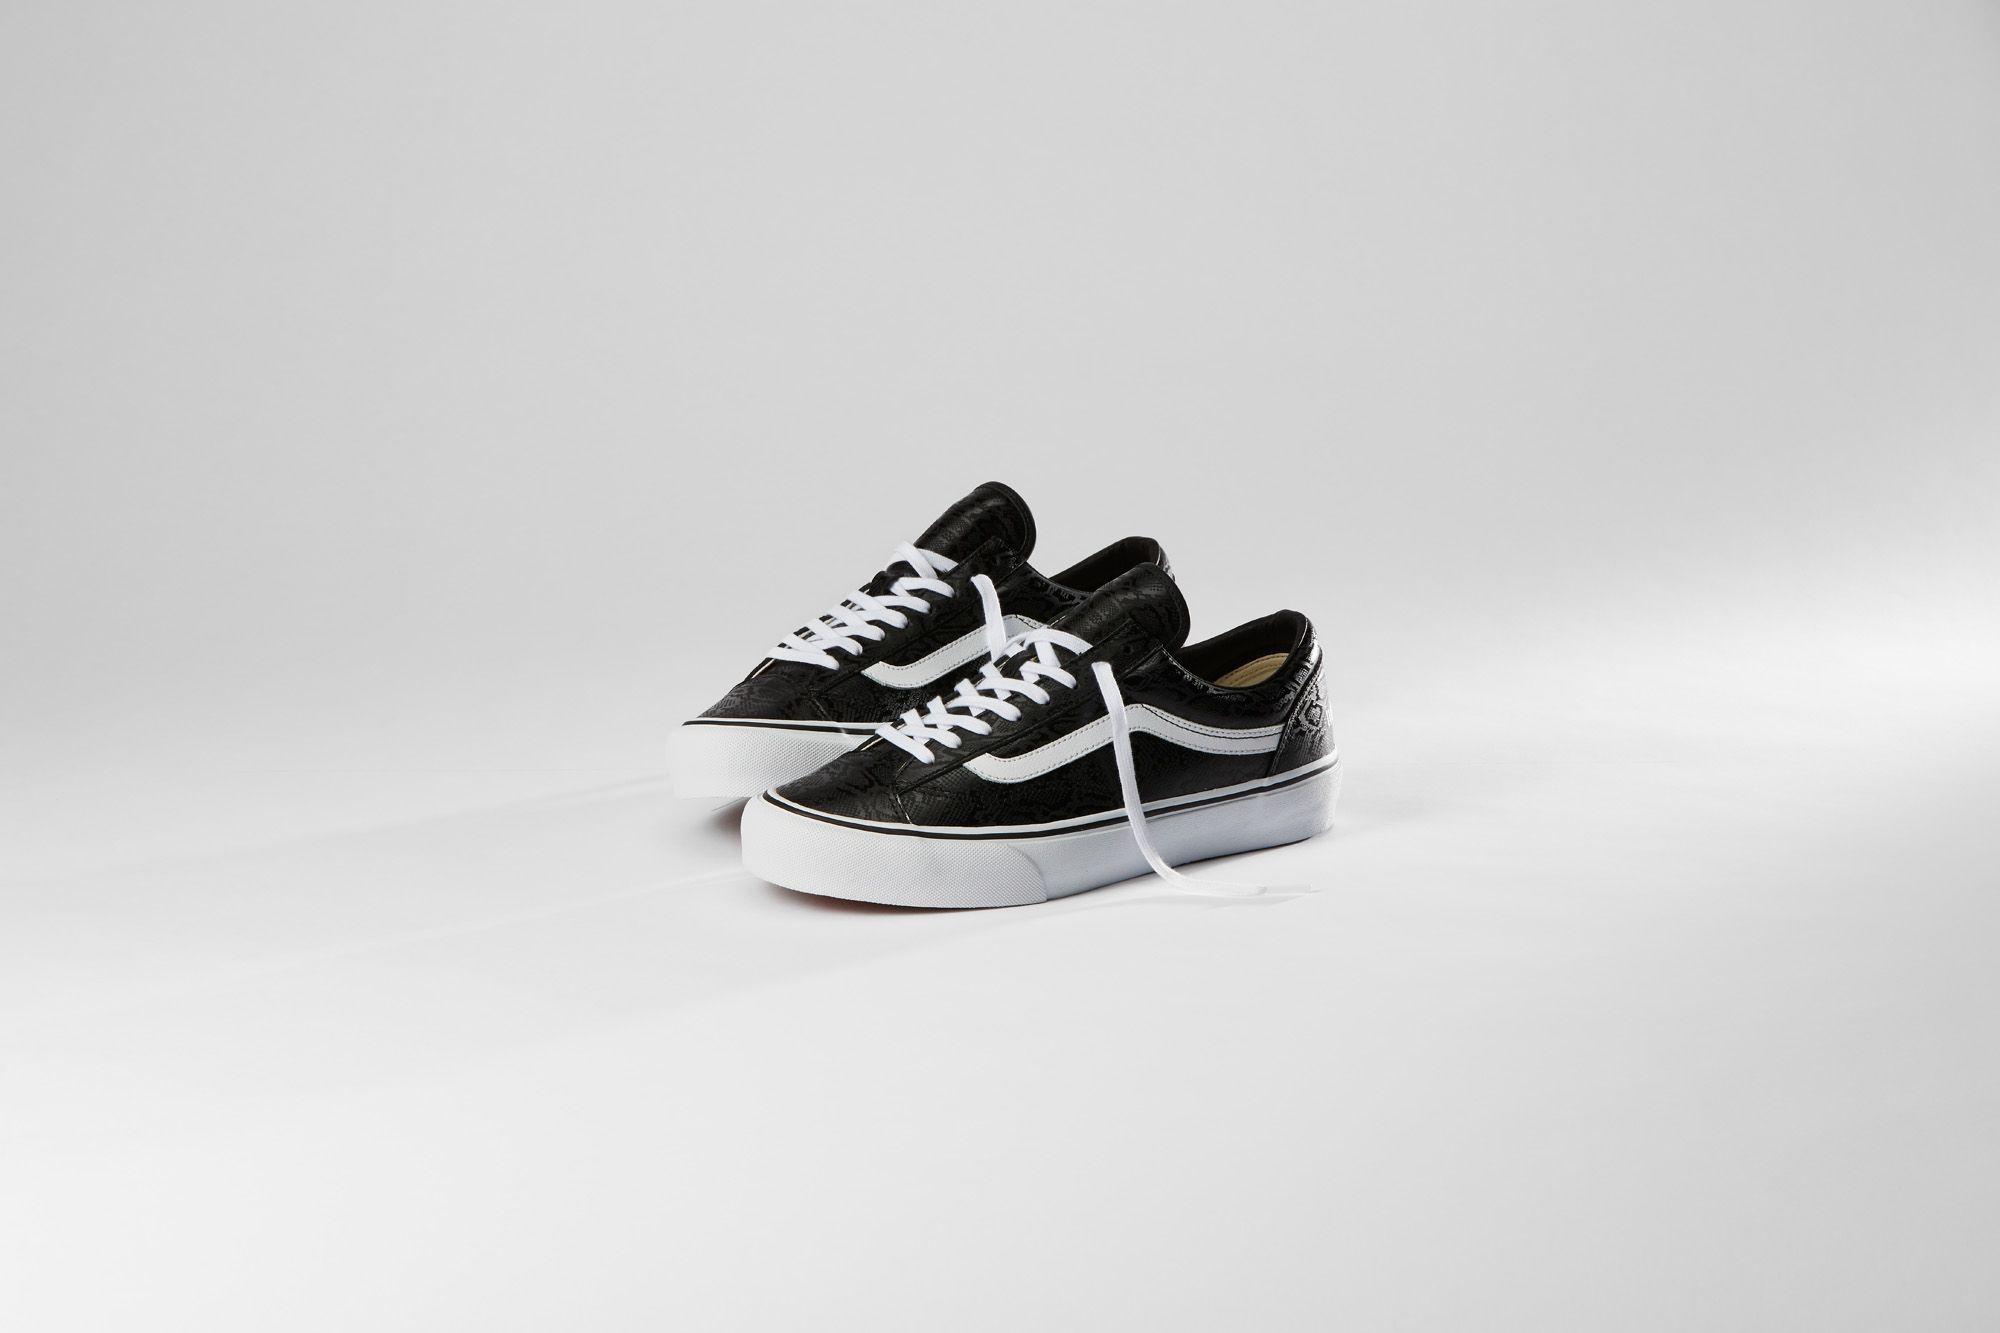 Vans Vault x Noon Goons Style 36 LX - black/snake - VN0A5FC36171 - product shot